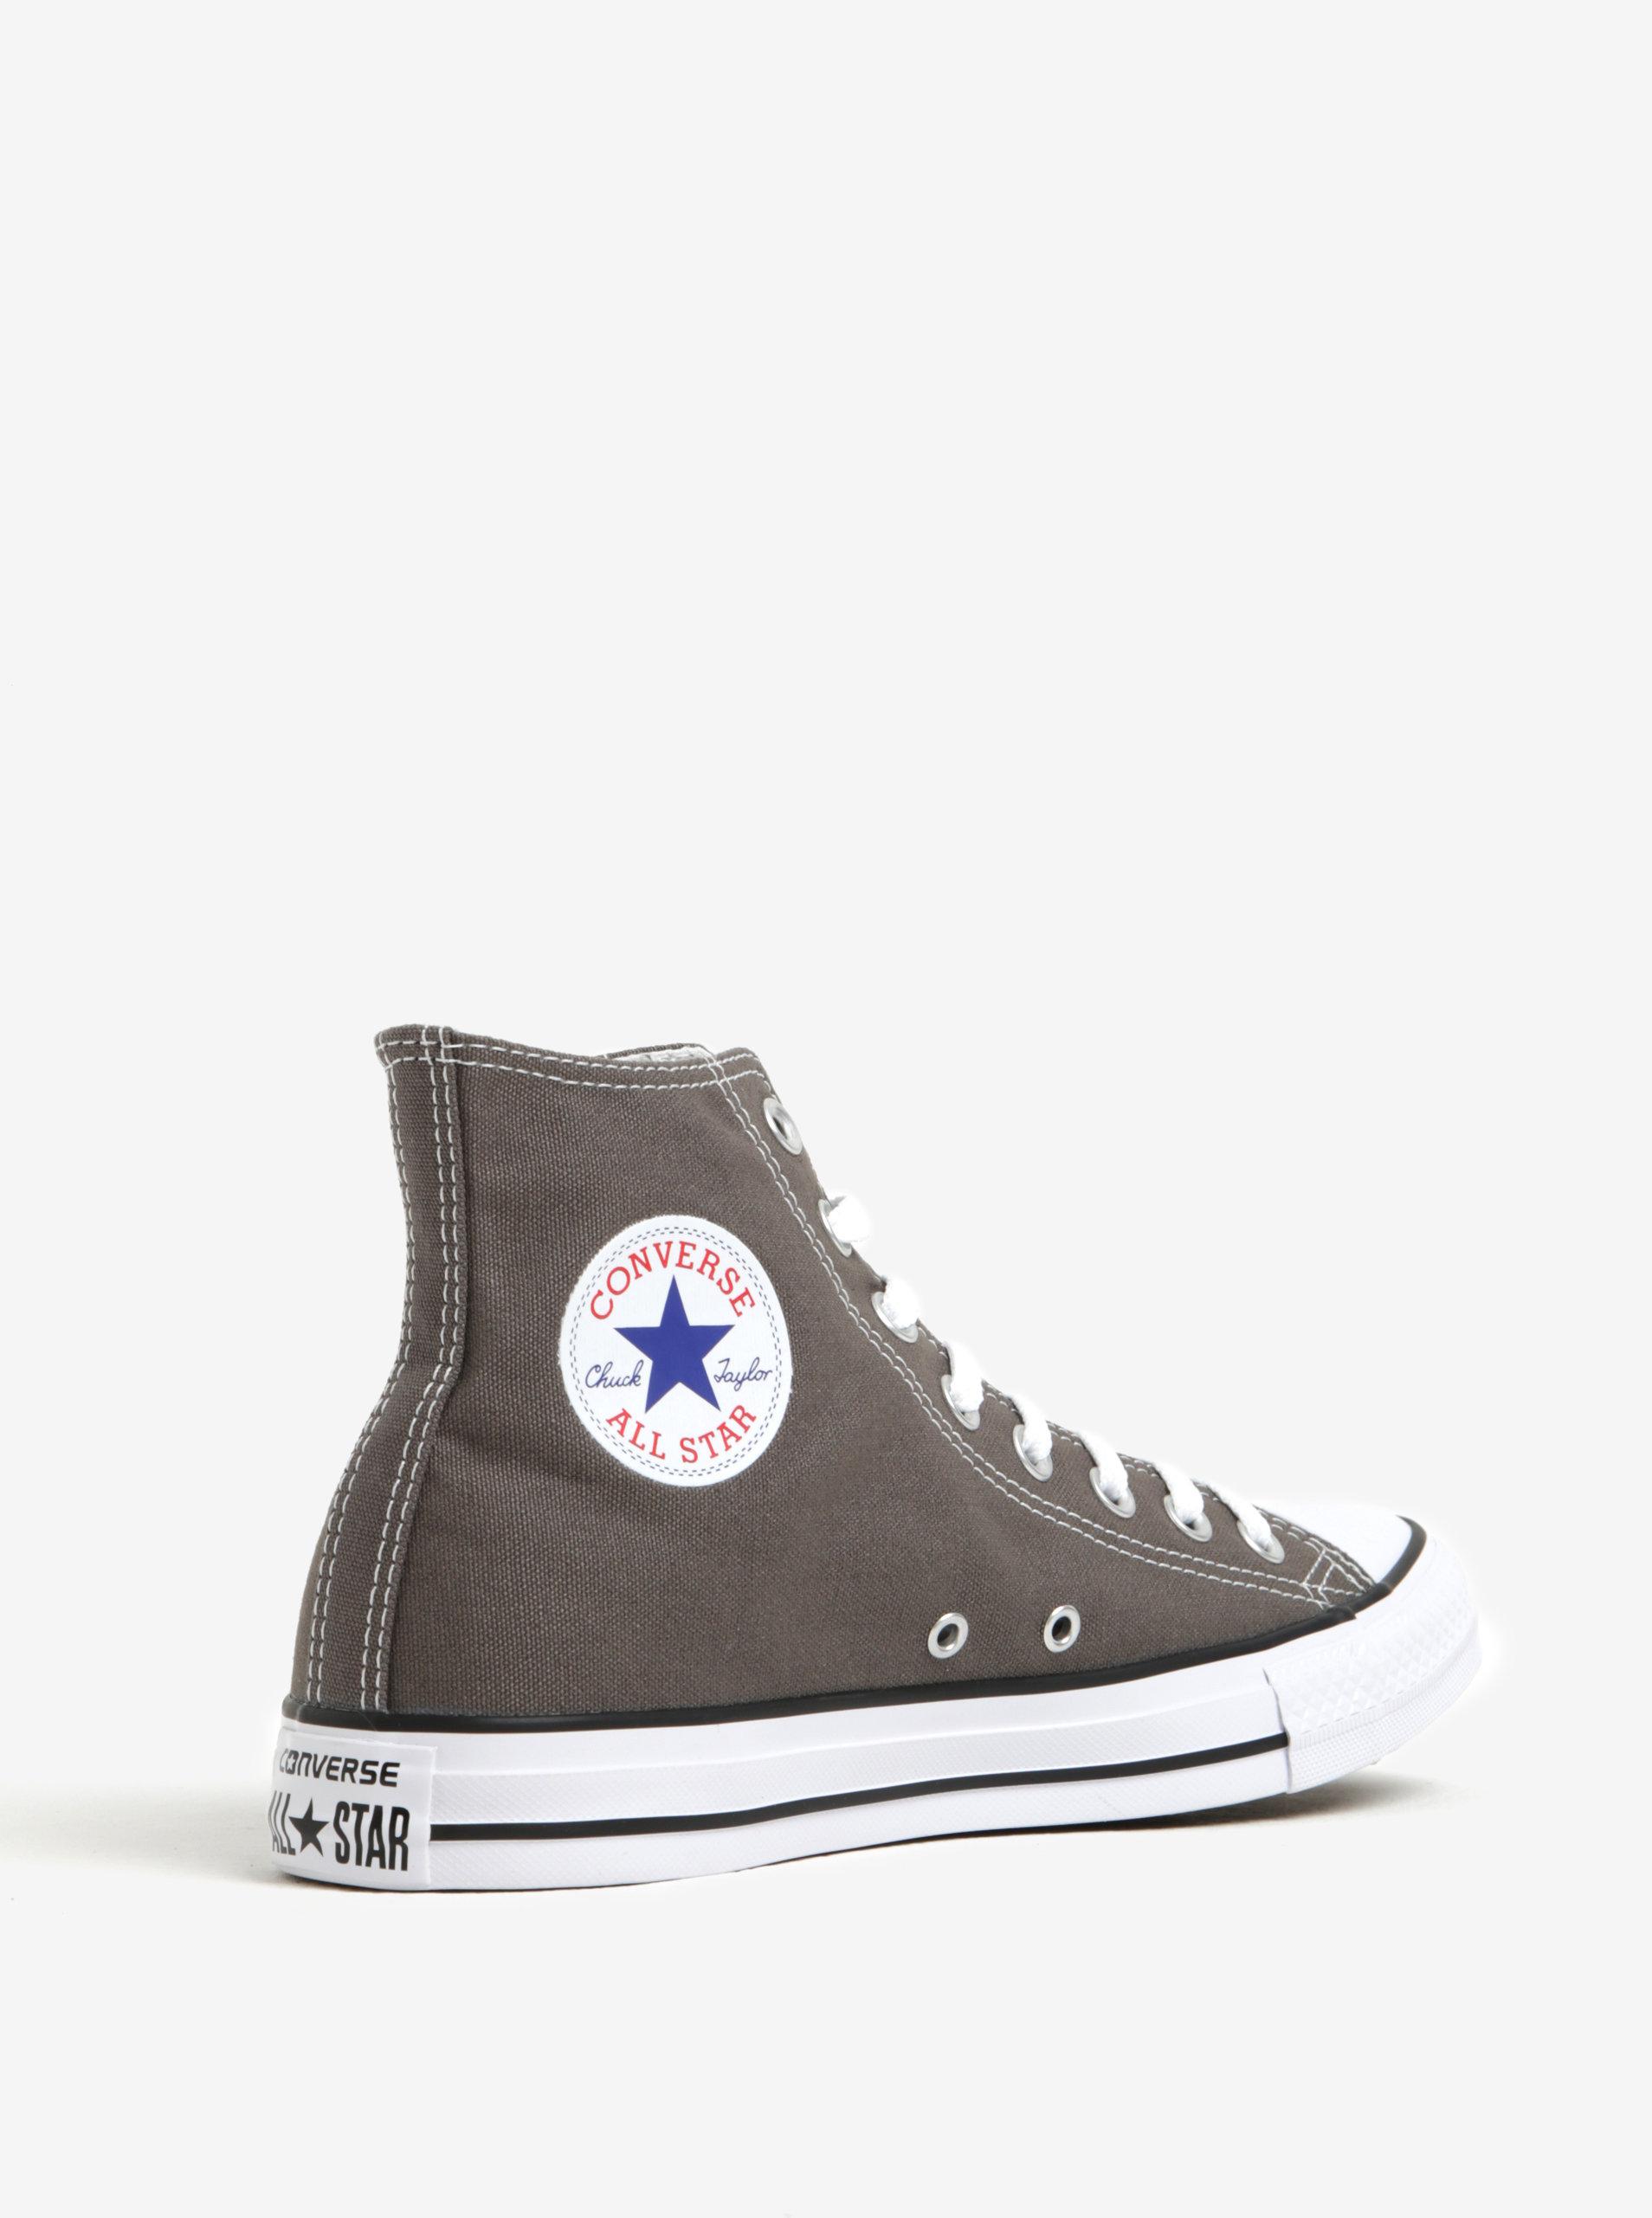 cad4fcae197 Šedé pánské kotníkové tenisky s logem Converse Chuck Taylor All Star ...